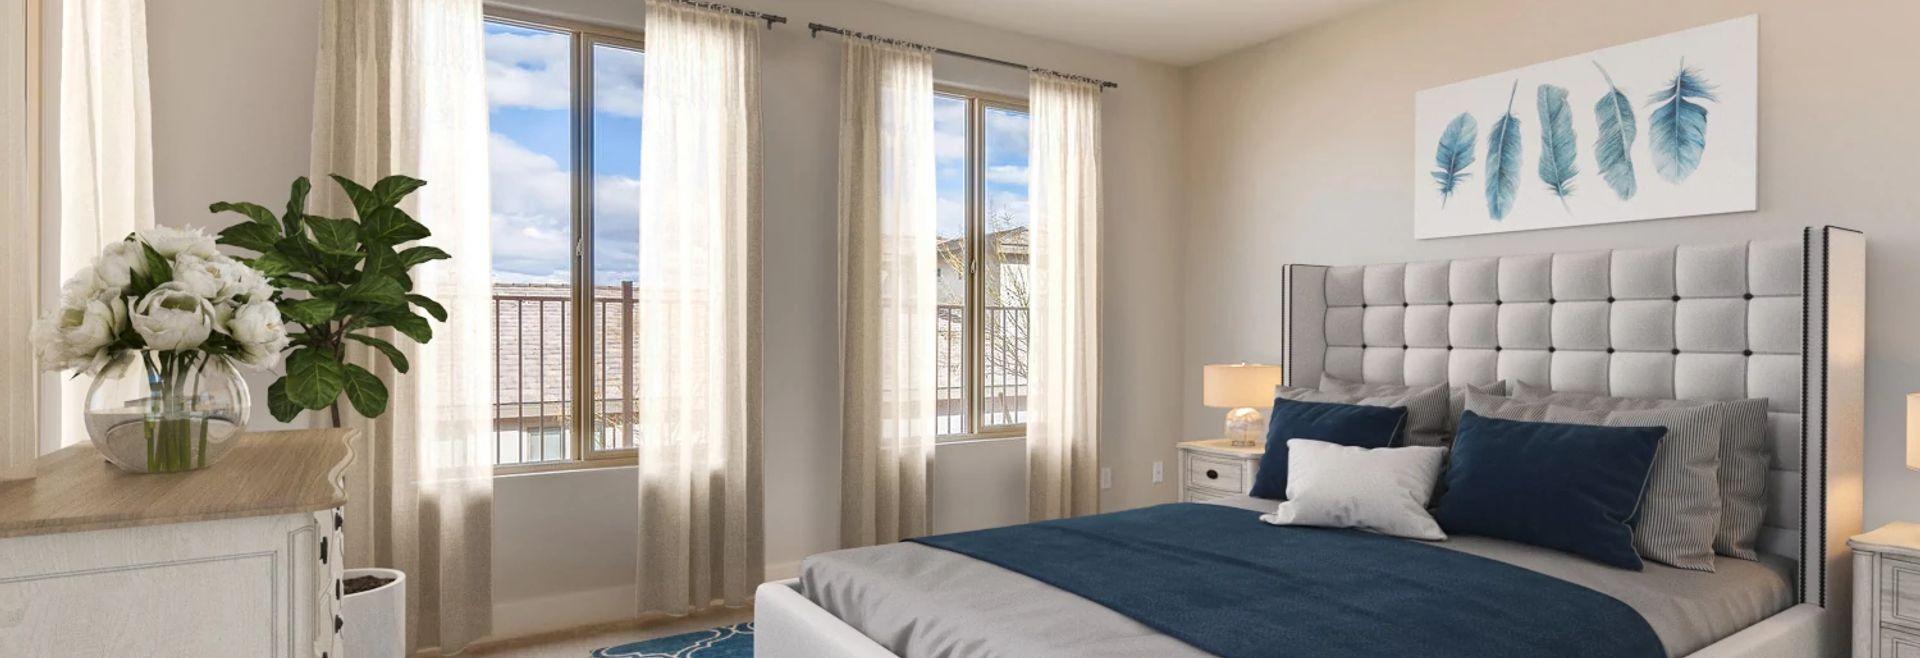 Trilogy Summerlin Explore Master Bedroom